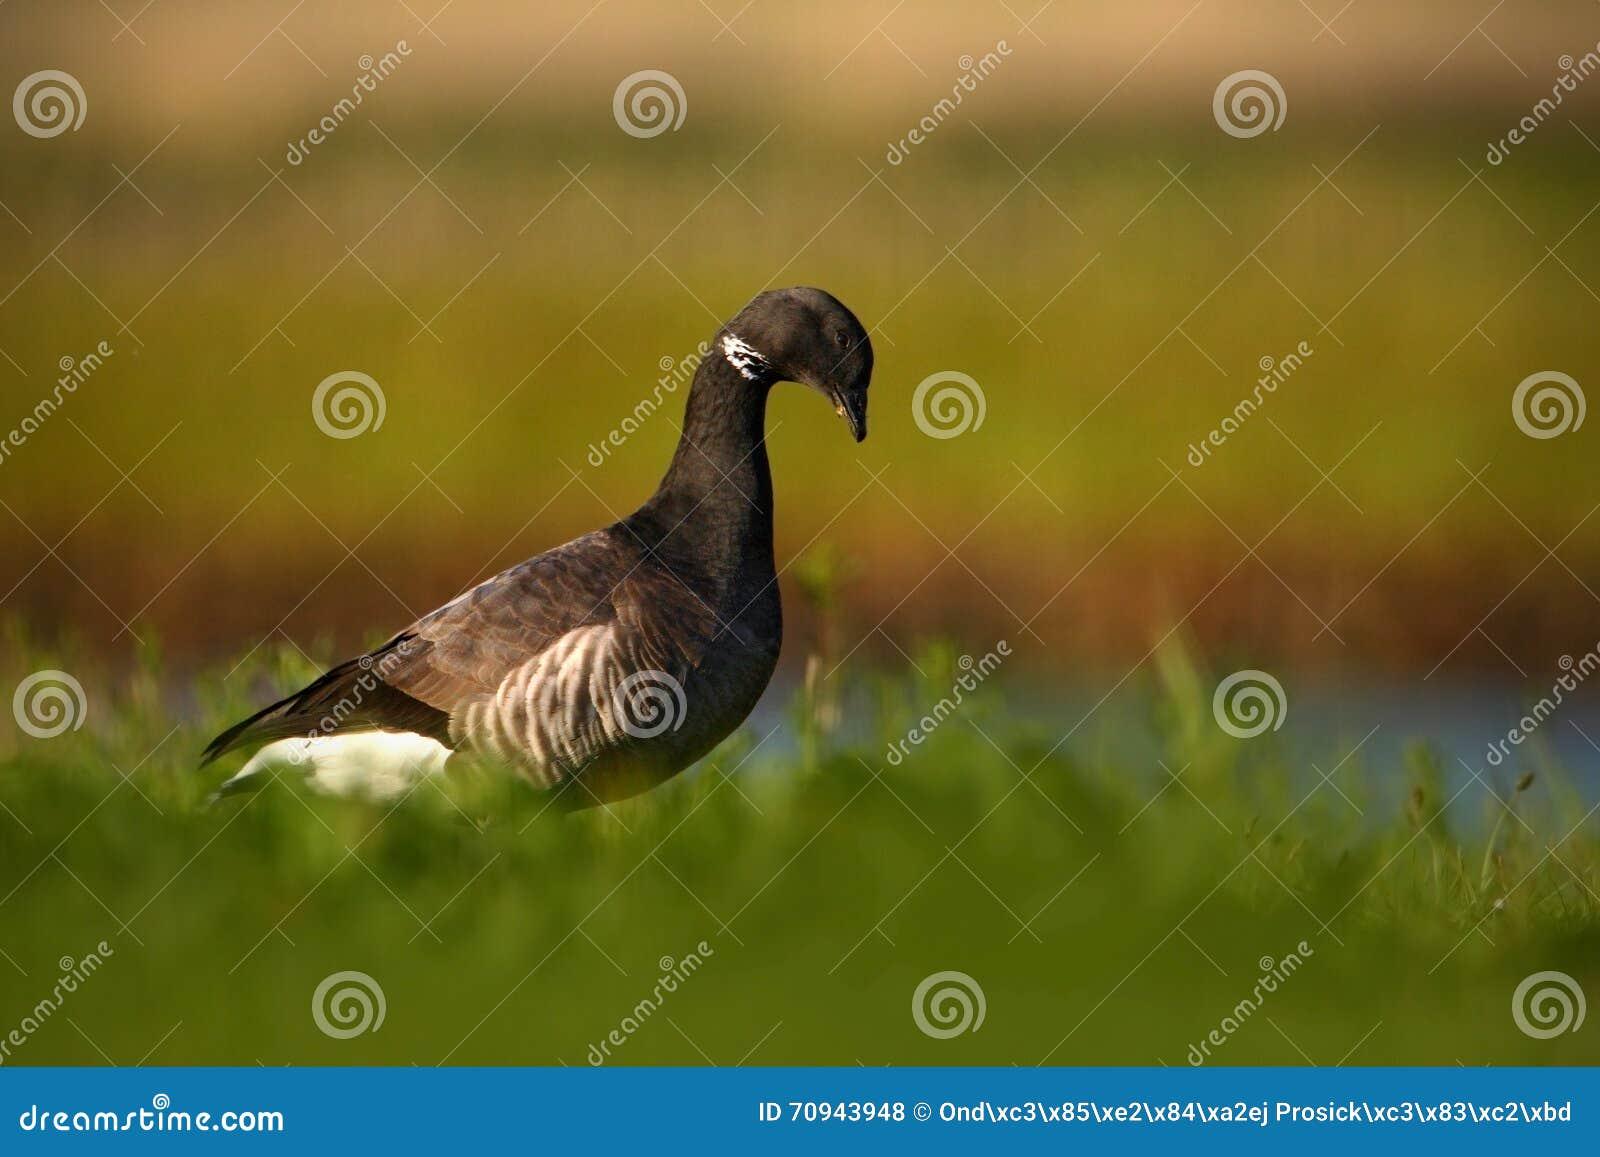 Brant ή χήνα του Brent, bernicla Branta, γραπτό πουλί στο νερό, ζώο στο βιότοπο χλόης φύσης, Γαλλία